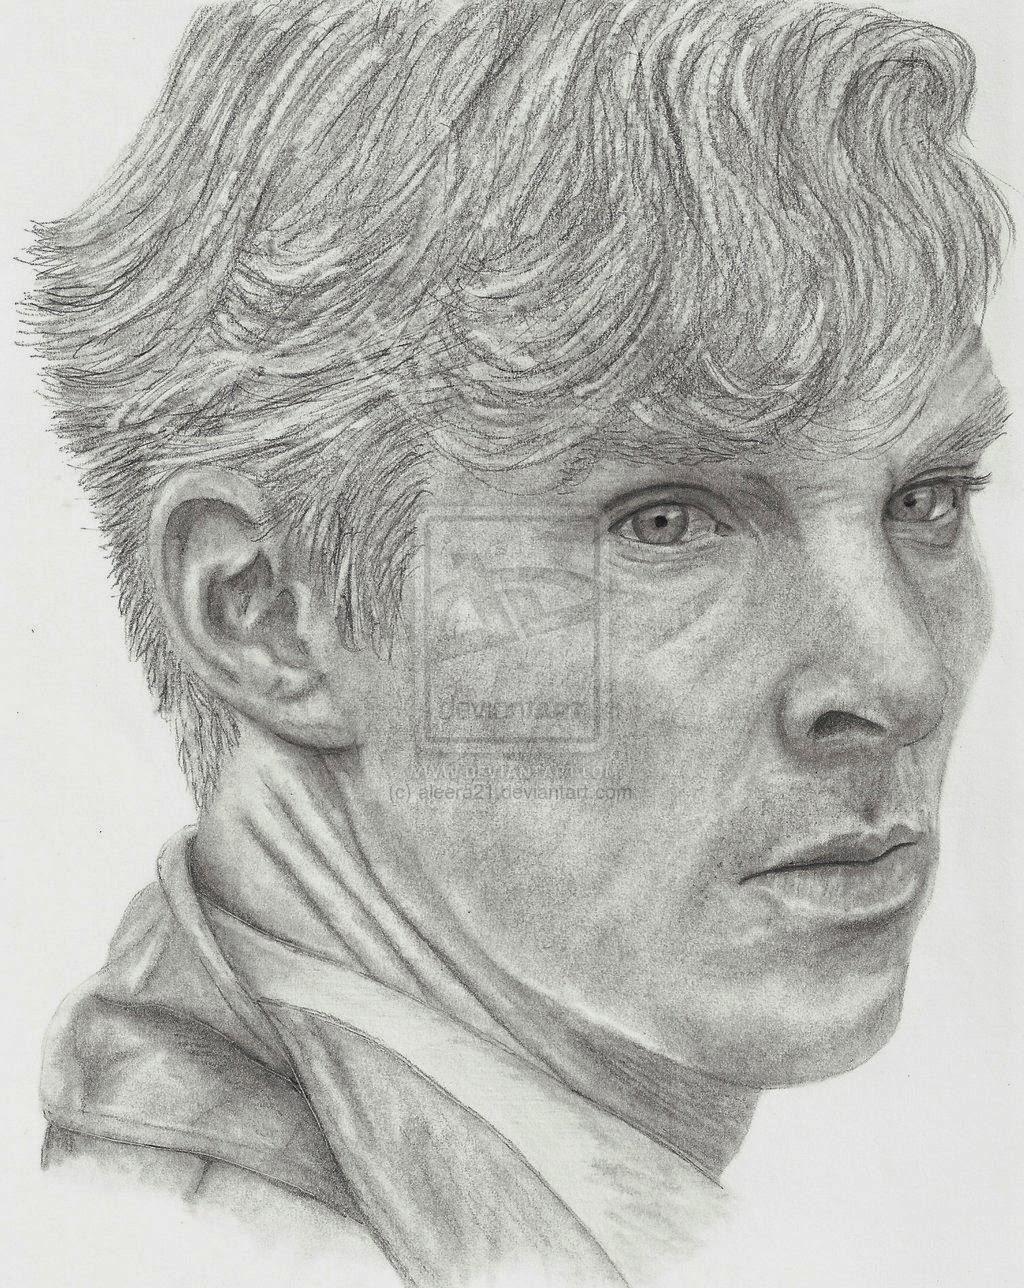 http://aleera21.deviantart.com/art/Christopher-Tietjens-Benedict-Cumberbatch-449524317